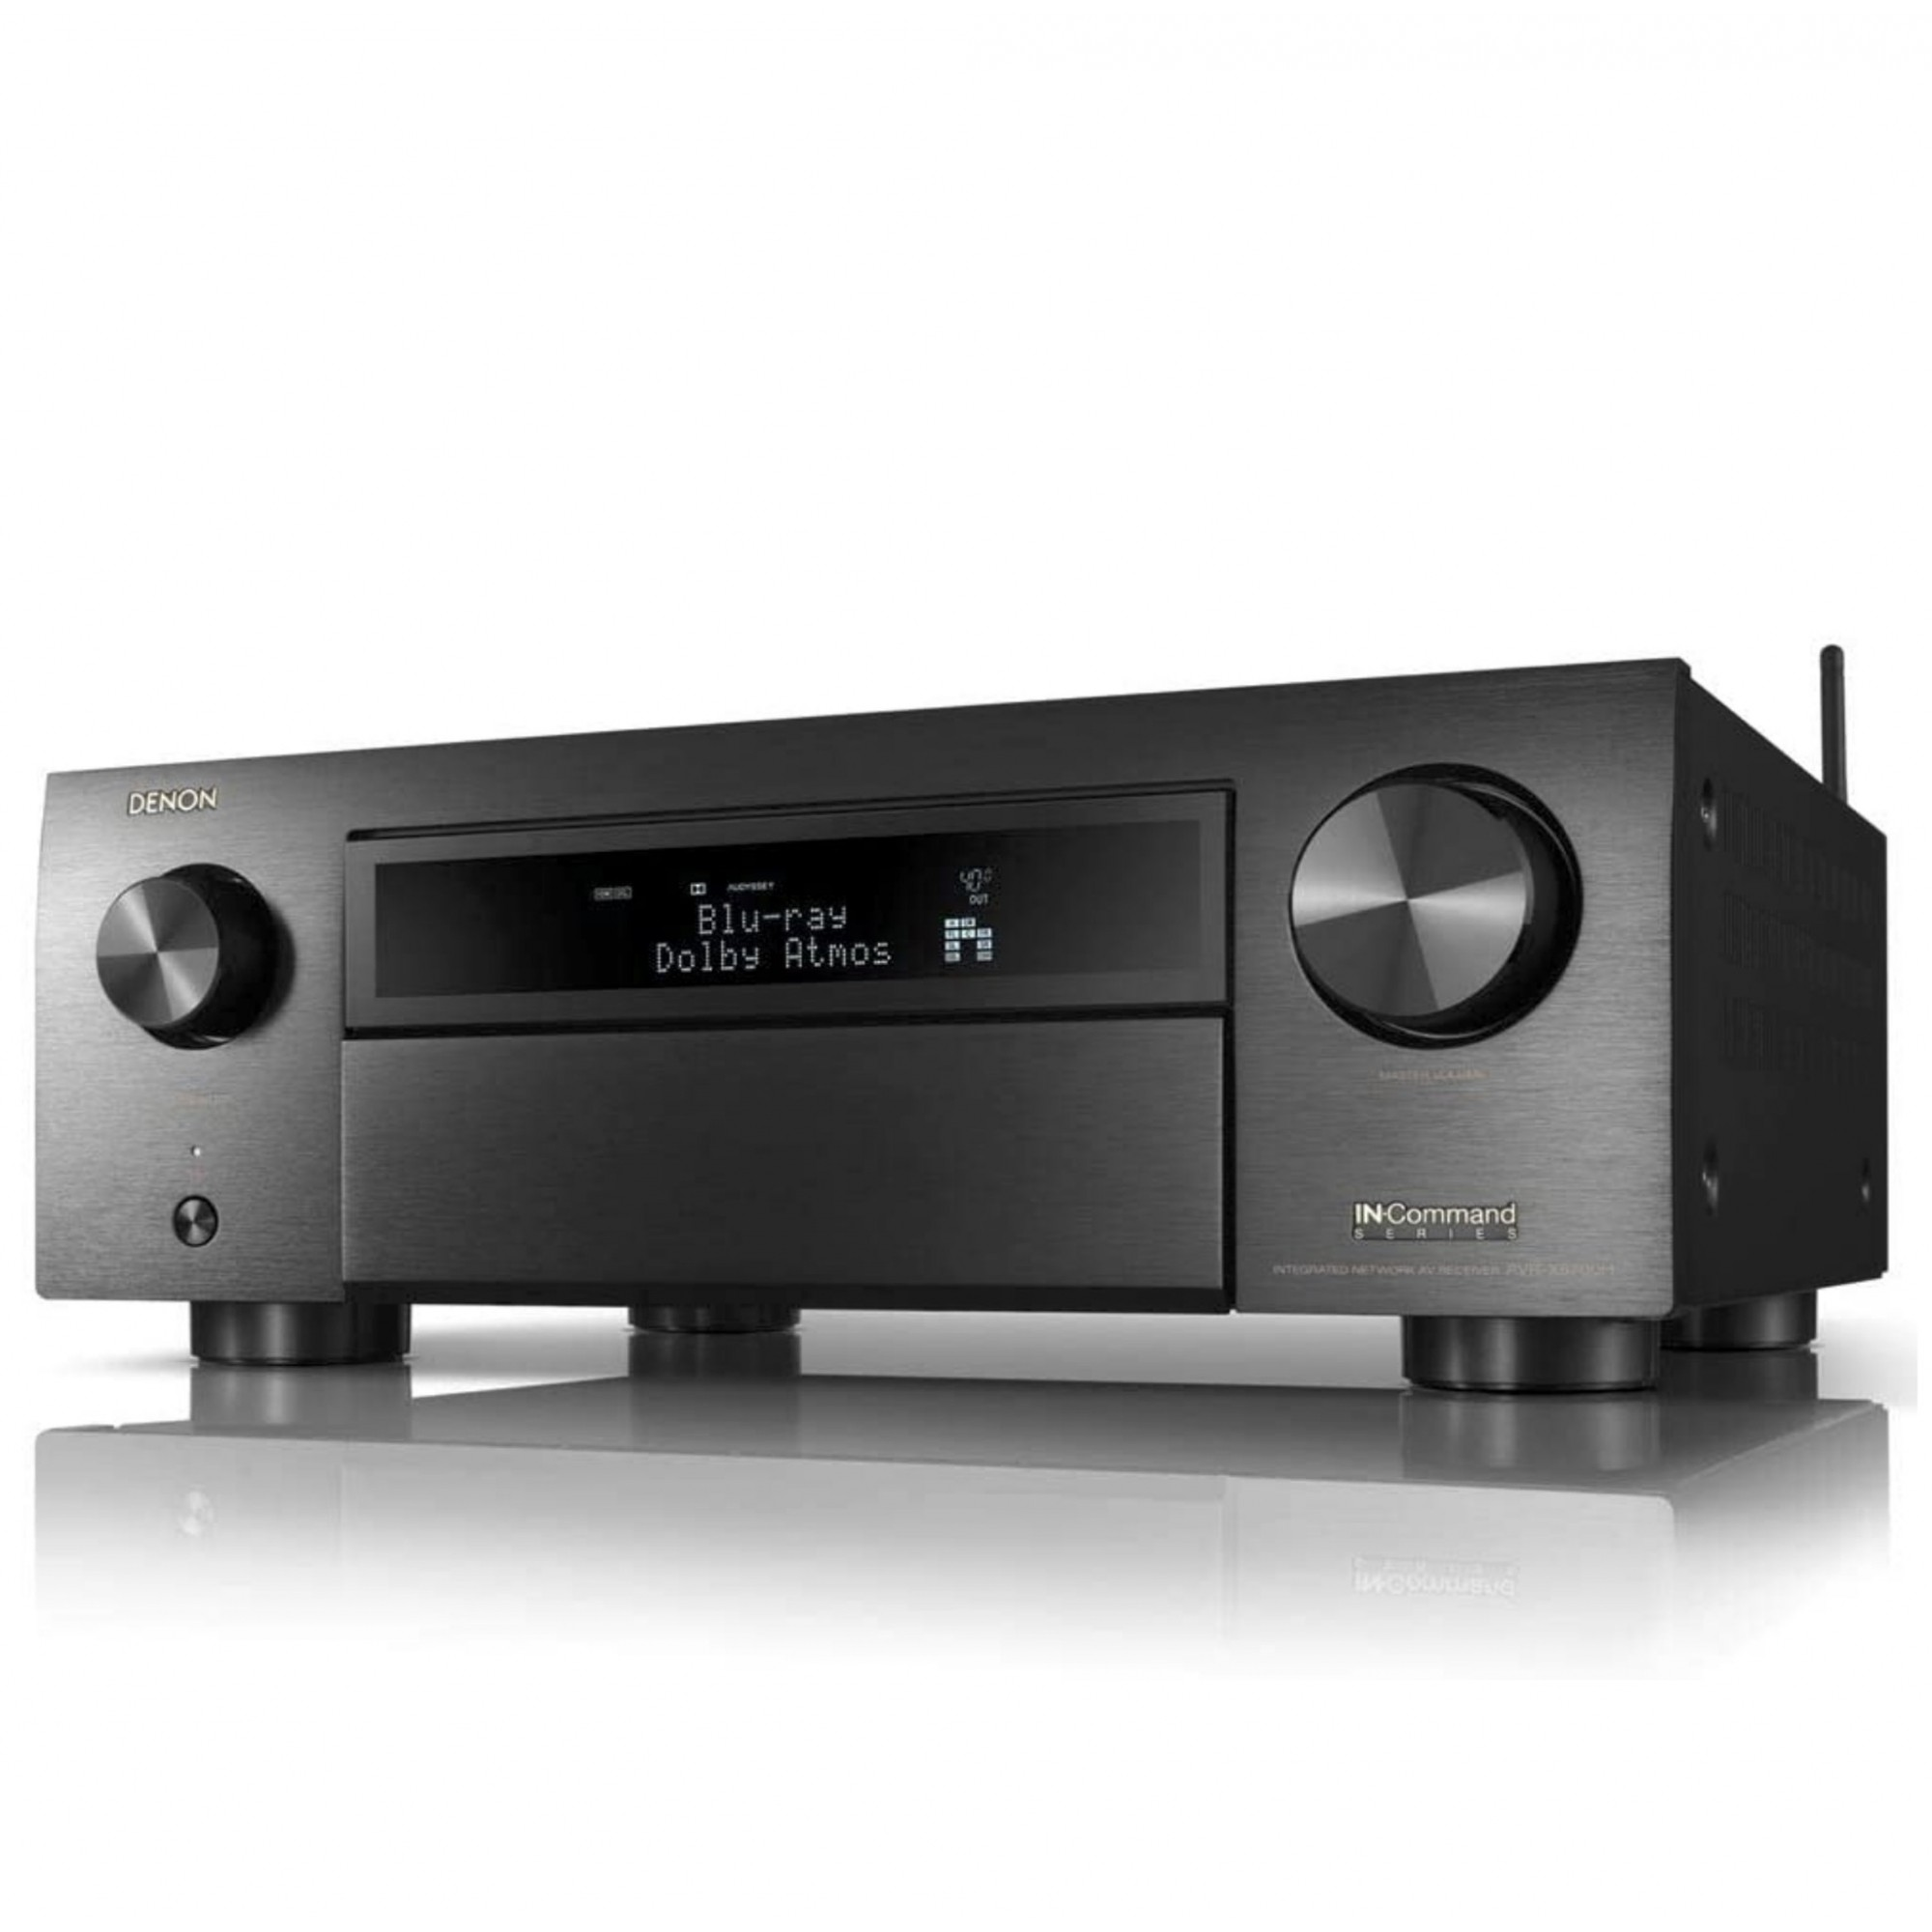 Receiver Denon AVR-X6700H ( Modelo 2020 ) 8k 11.2 canais Bluetooth Wifi Dolby Atmos Heos Wireless HDR - 3 saídas HDMI 110V